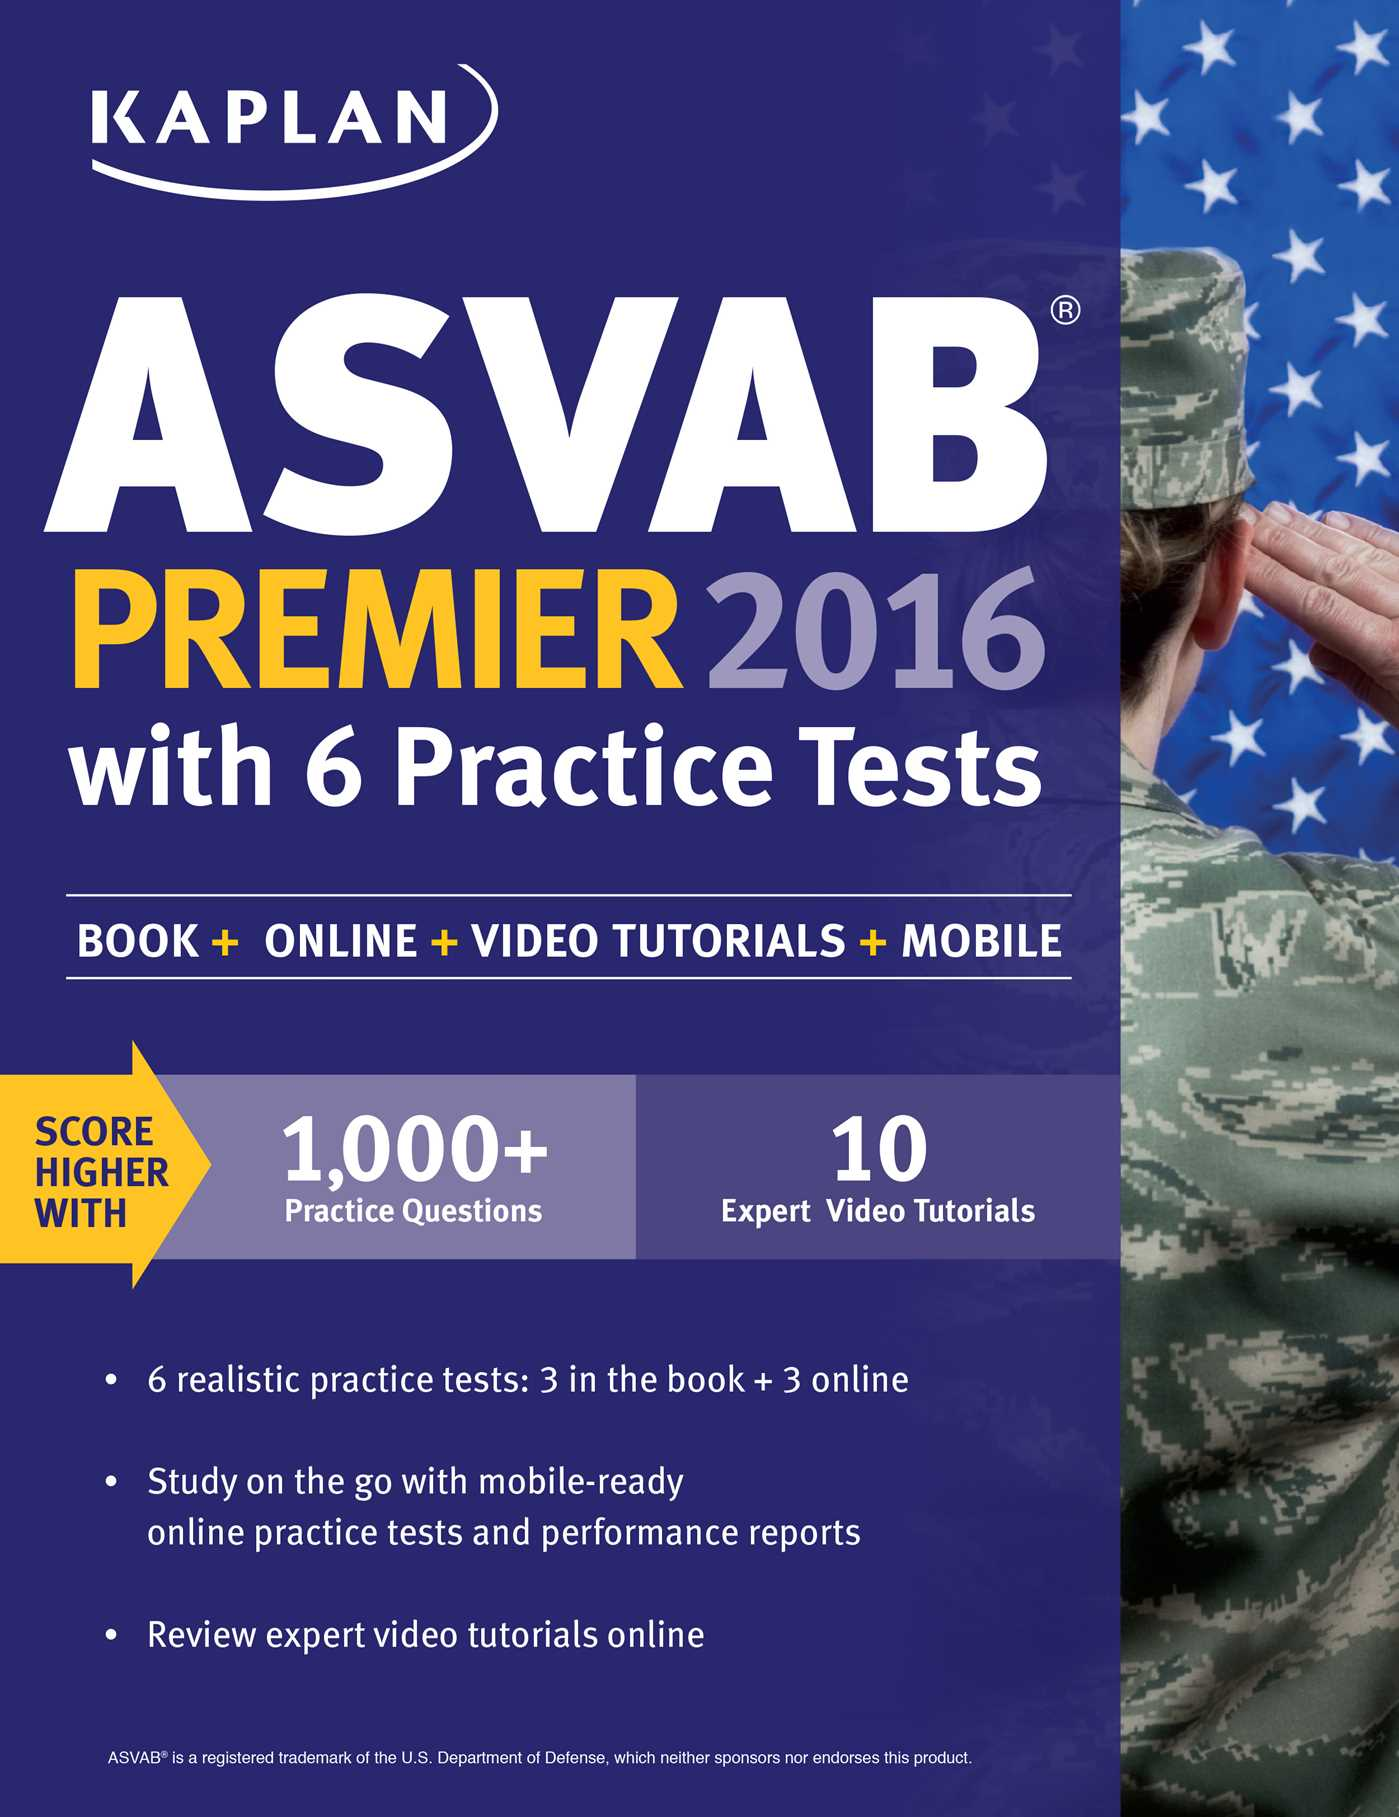 Book Cover Image (jpg): Kaplan ASVAB Premier 2016 with 6 Practice Tests